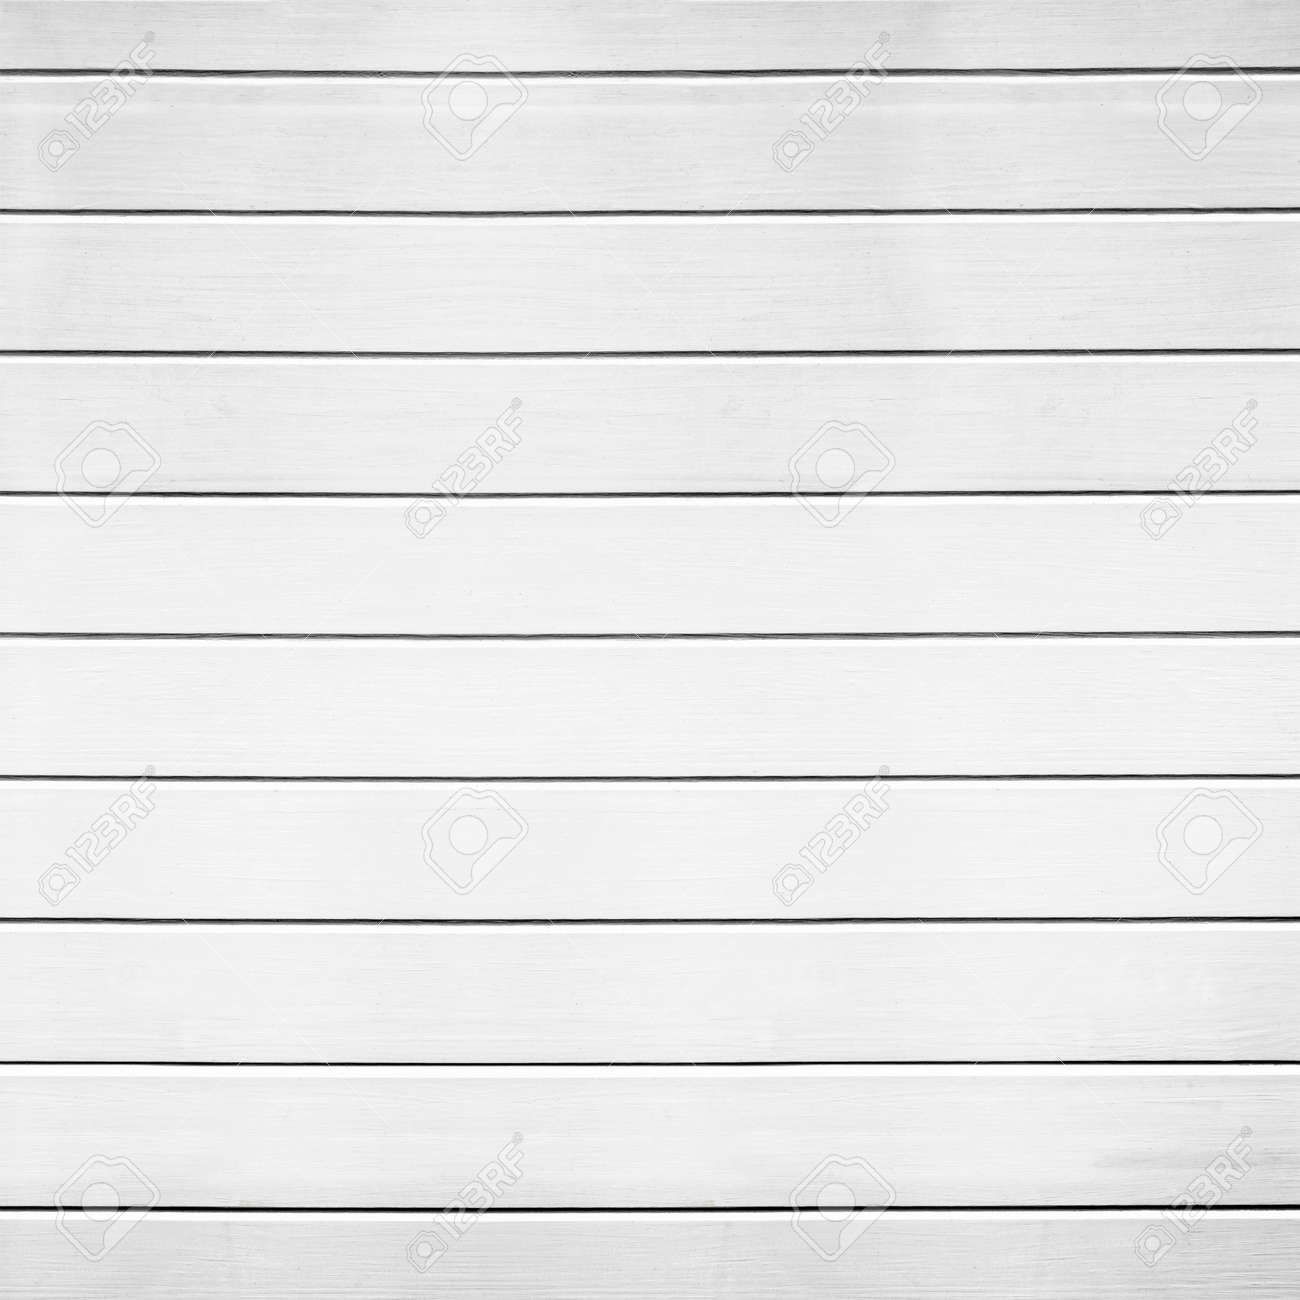 Stock Photo - White wood panel background. - White Wood Panel Background. Stock Photo, Picture And Royalty Free